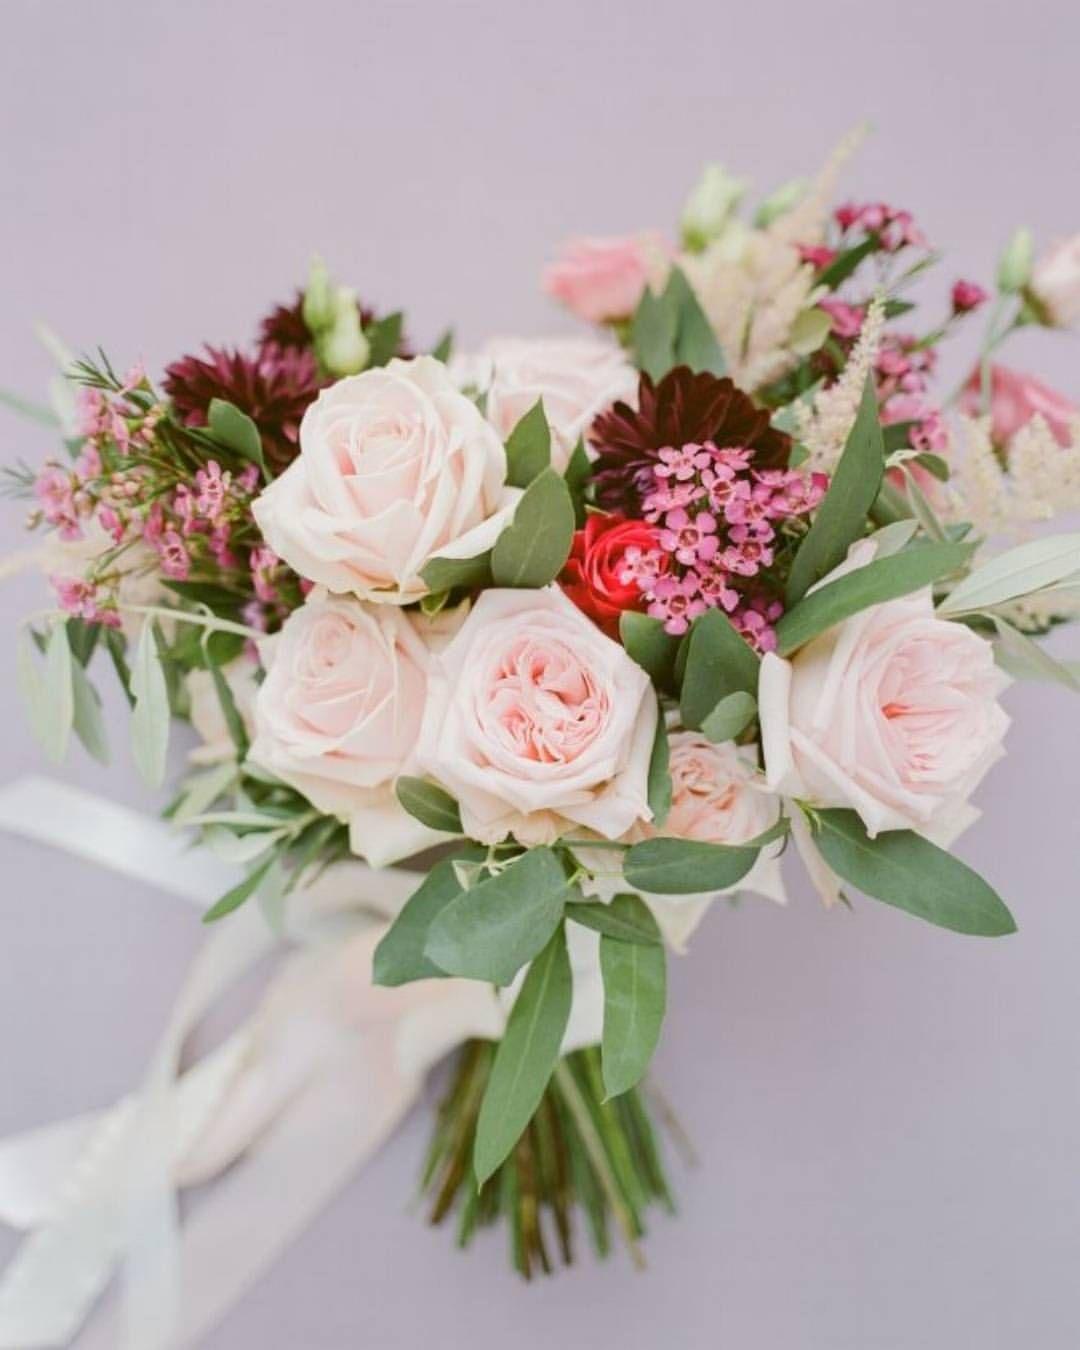 Enough greenery beautiful flowers ゚ pinterest